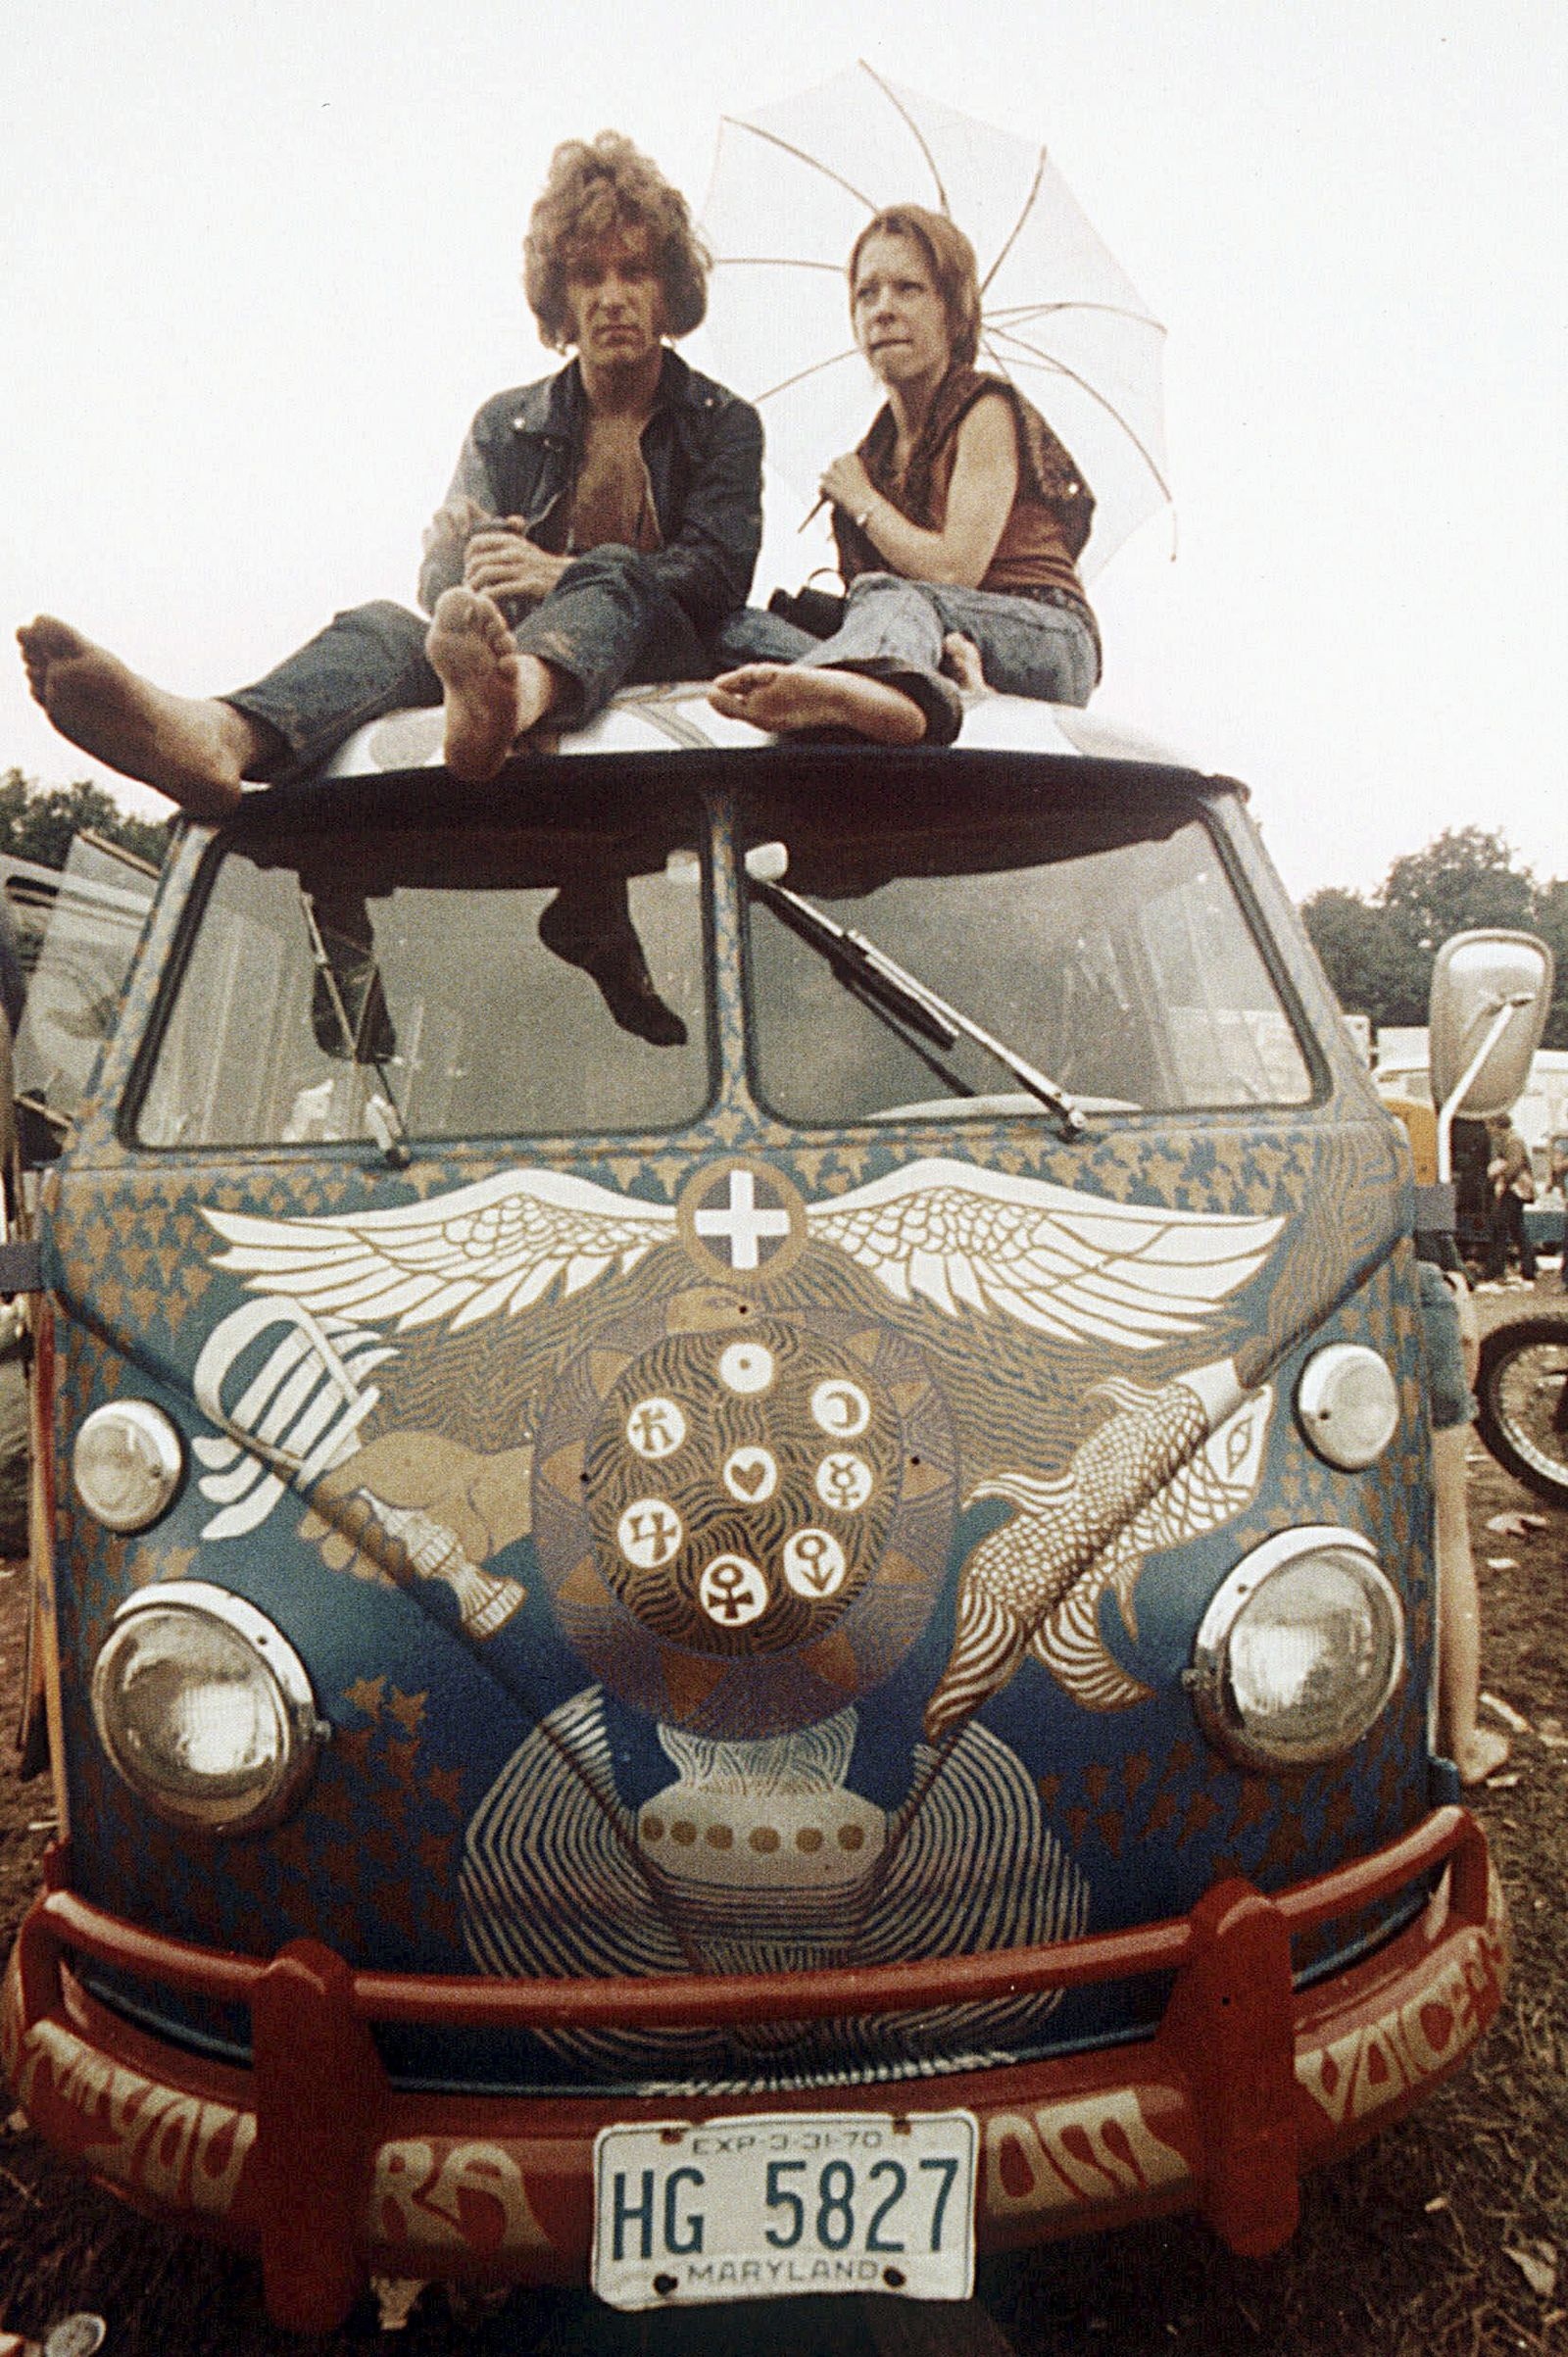 RP Woodstock Jahrestag